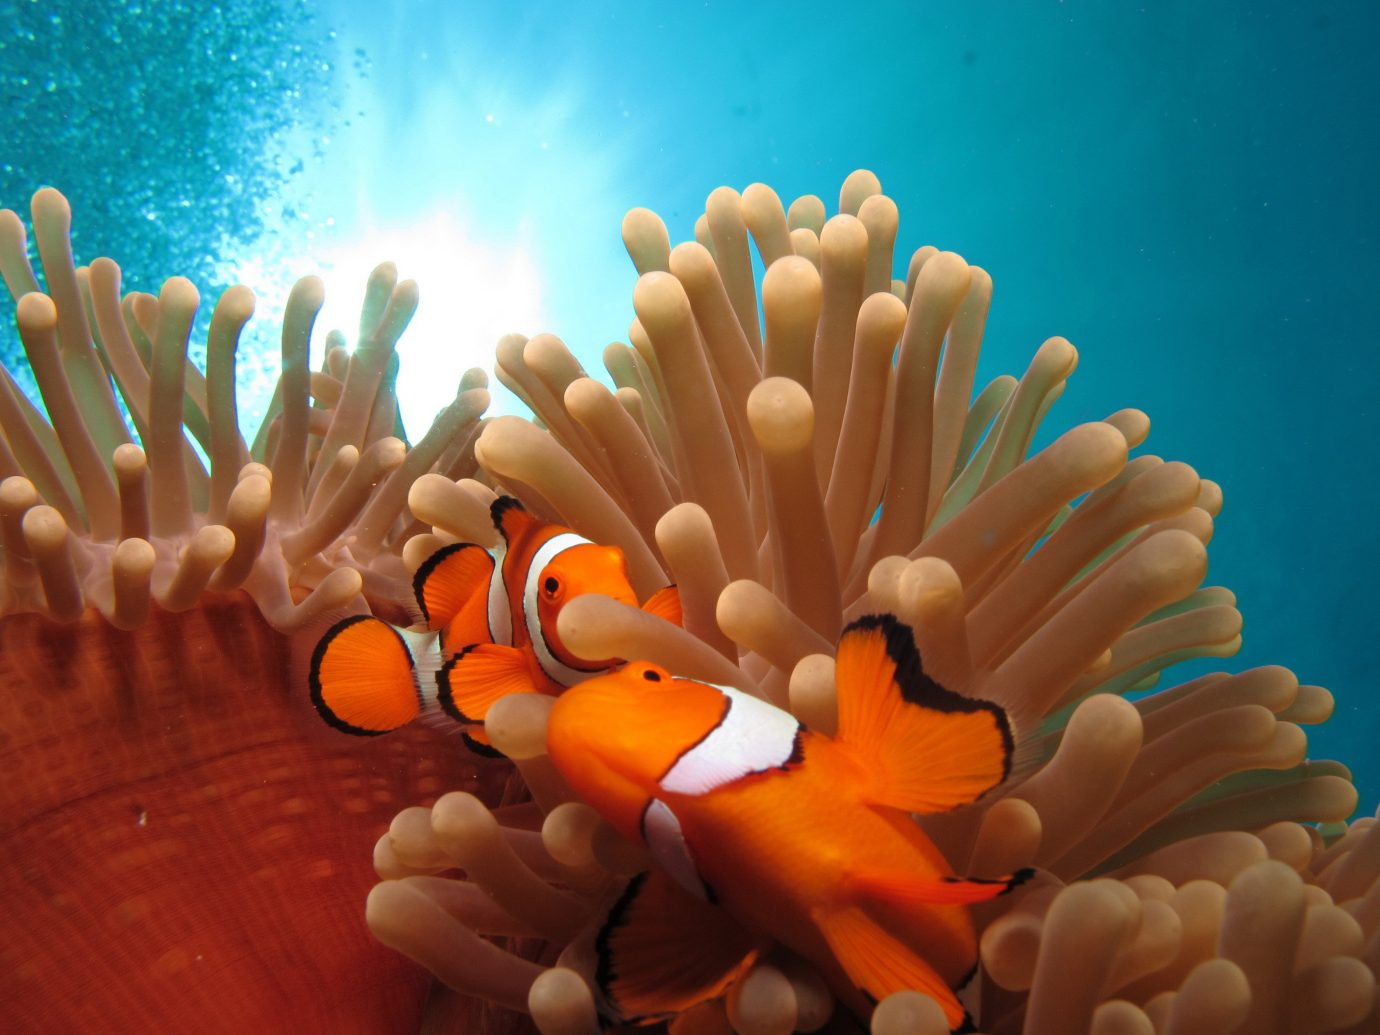 Trip Ideas indoor orange anemone fish marine biology pomacentridae sea anemone animal coral biology coral reef organism underwater coral reef fish decorated macro photography invertebrate marine invertebrates coelenterate reef fish cnidaria illustration